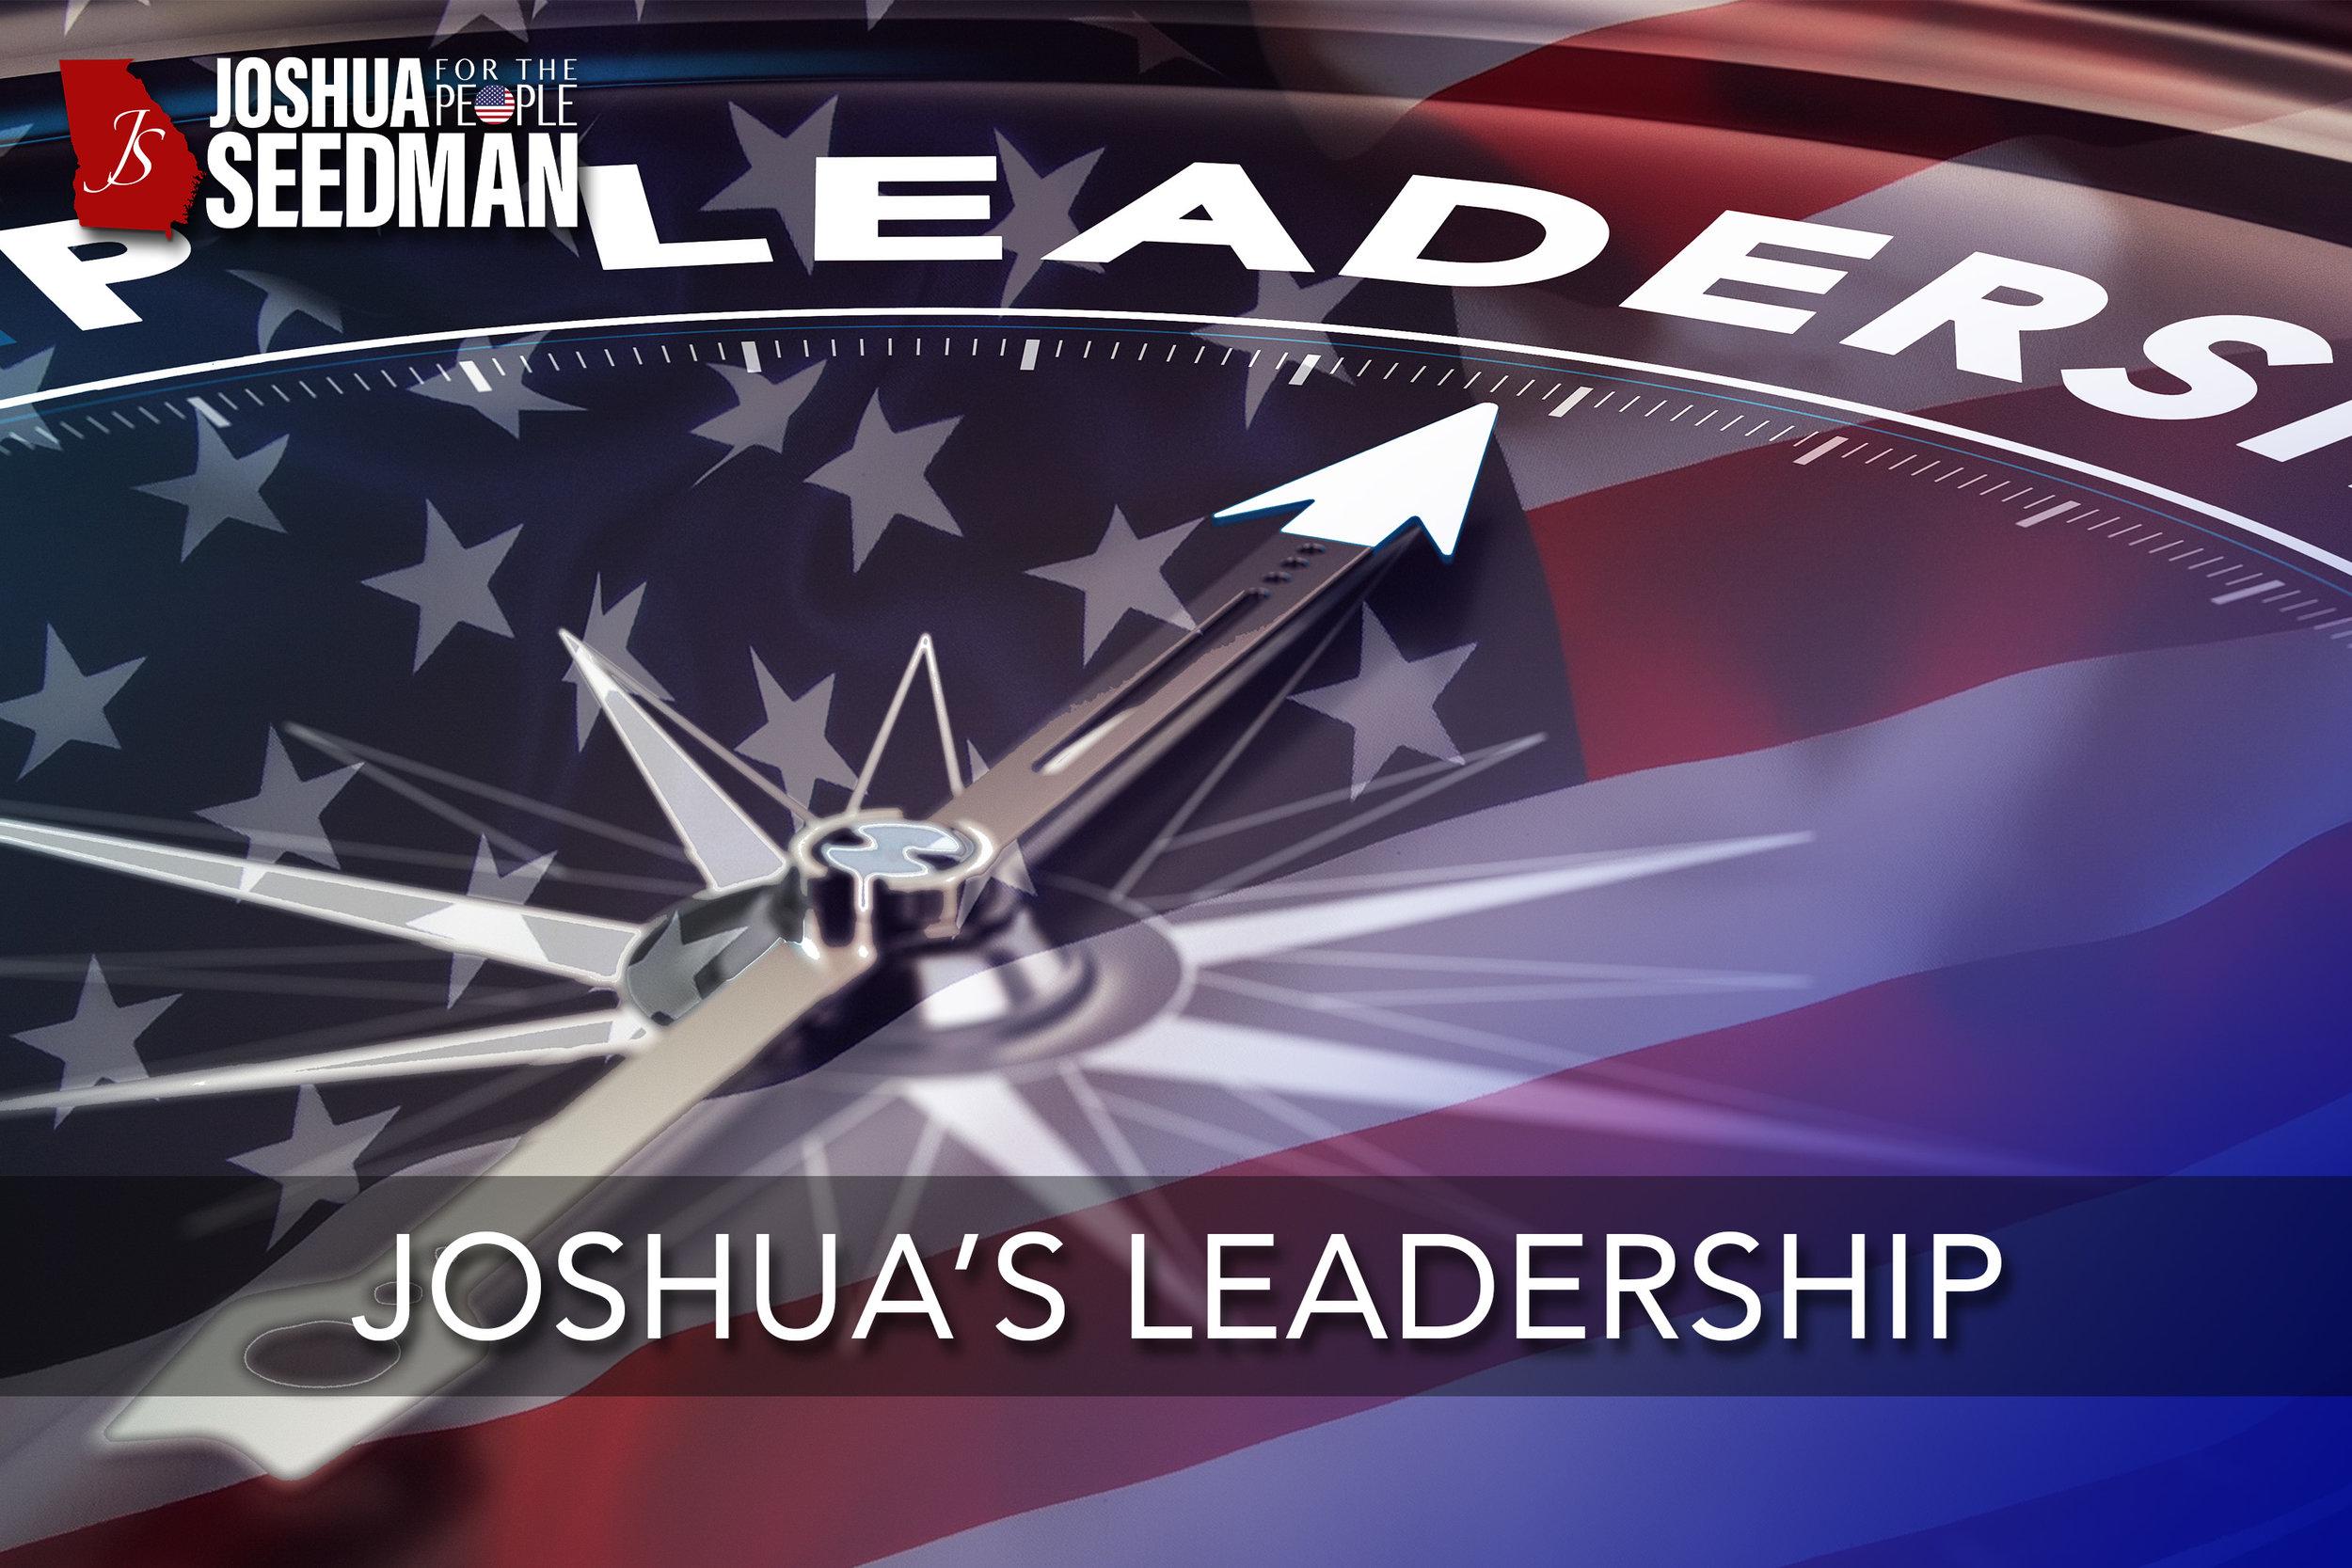 Joshua's Leadership - Thumbnail.jpg